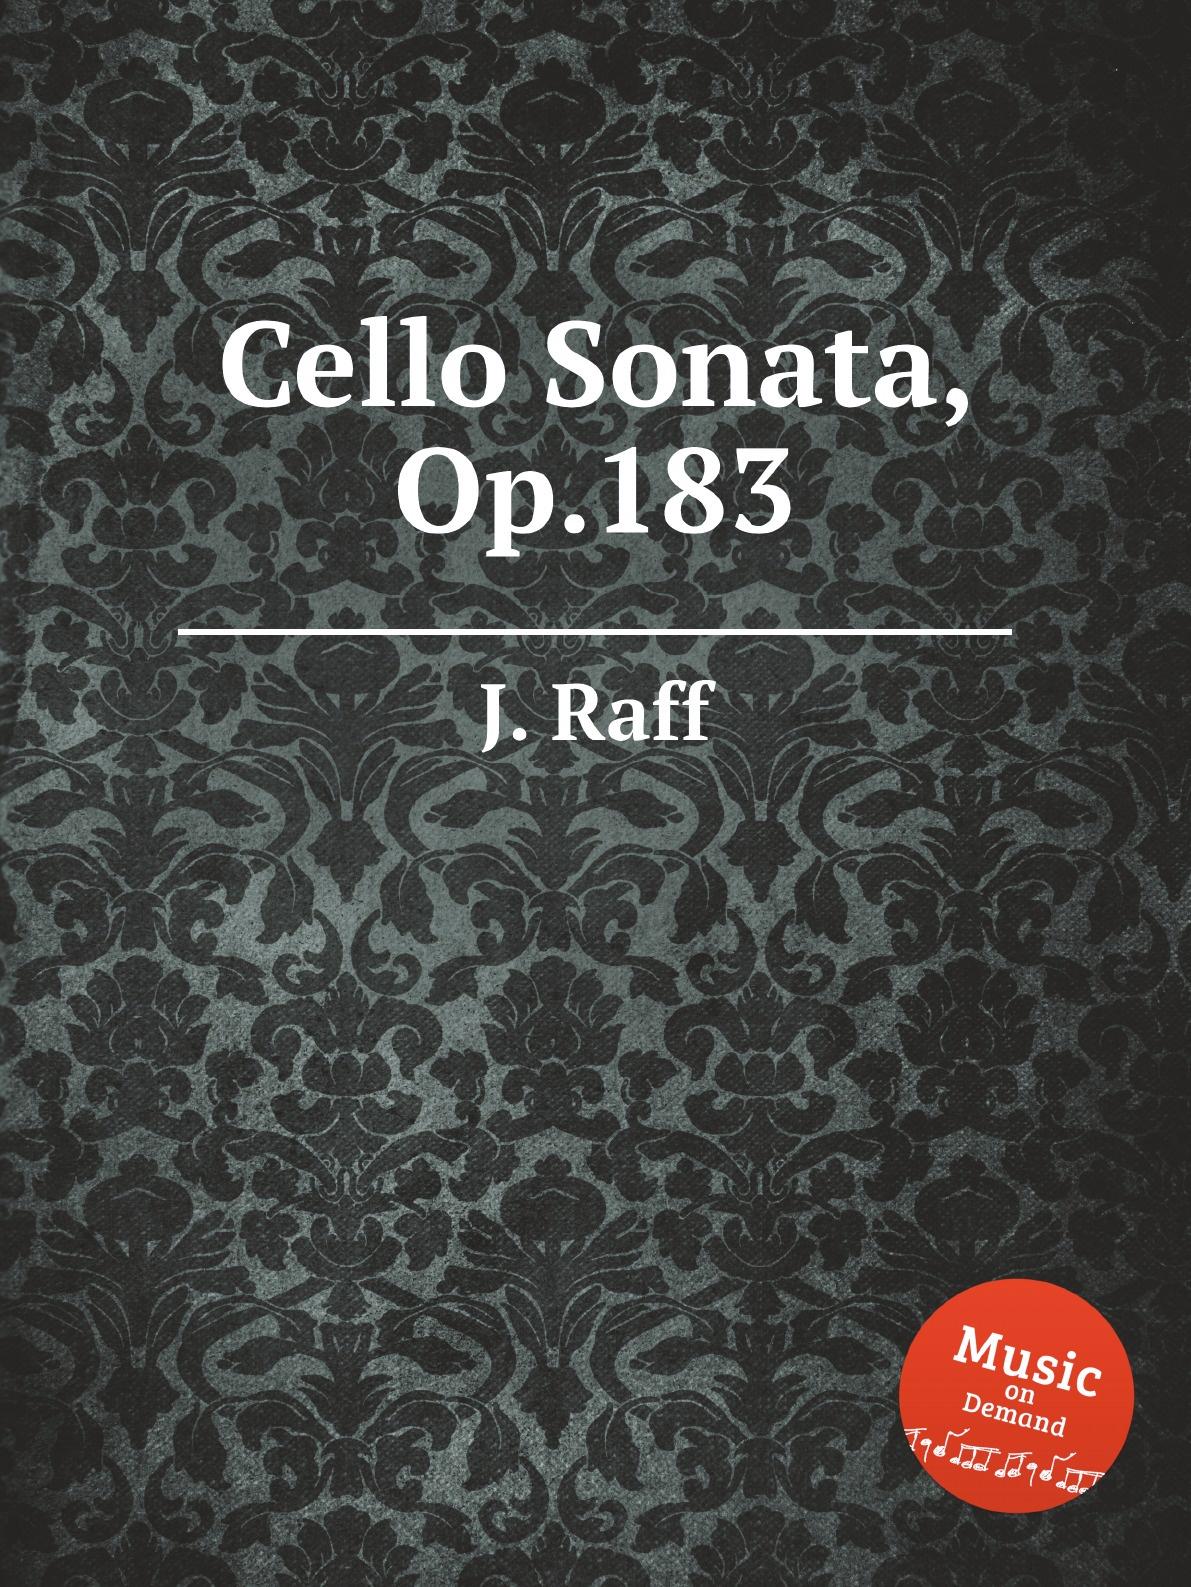 J. Raff Cello Sonata, Op.183 j street cello sonata quasi fantasia op 22